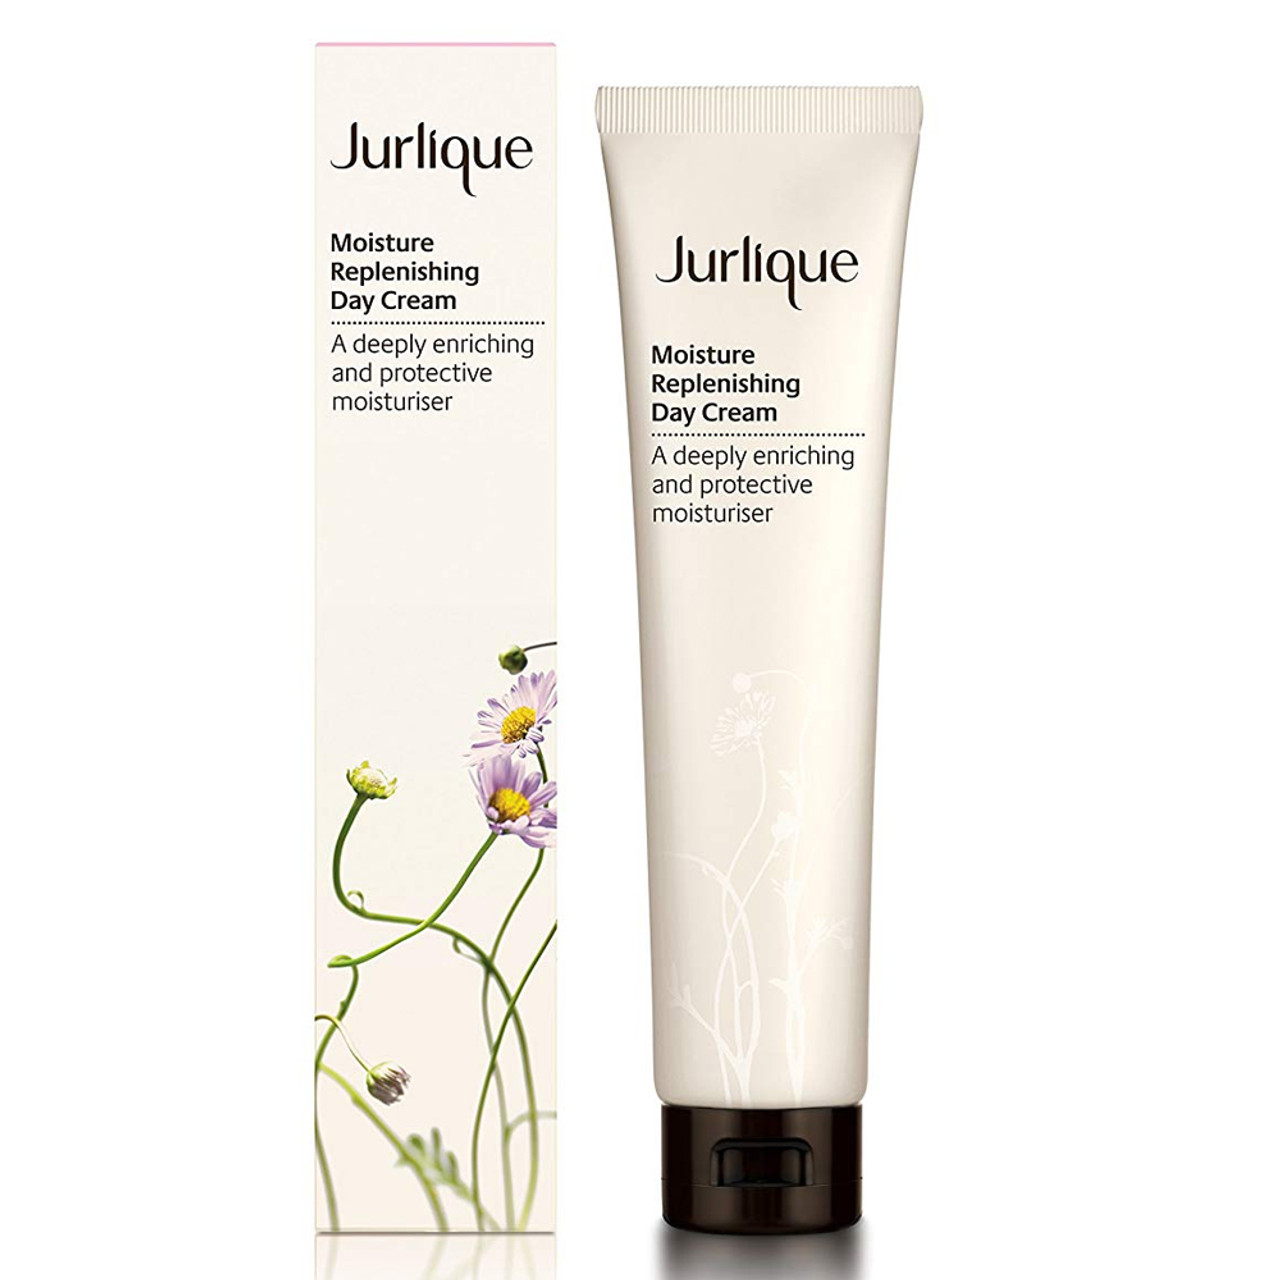 Jurlique Moisture Replenishing Day Cream (discontinued) BeautifiedYou.com